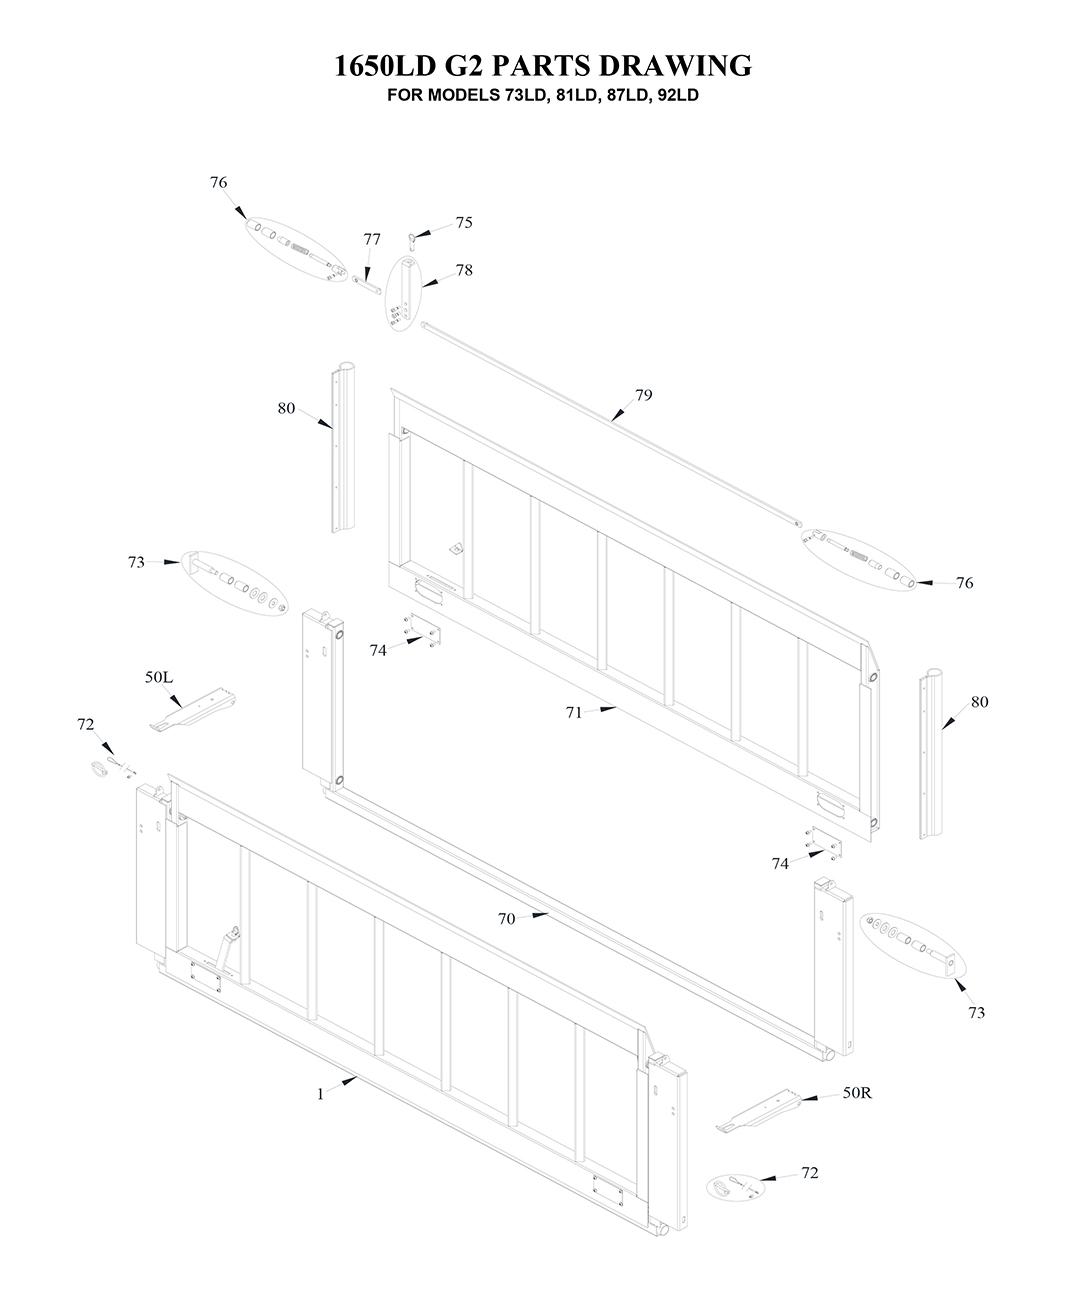 liftgate diagrams tommy gate liftgate parts diagrams. Black Bedroom Furniture Sets. Home Design Ideas